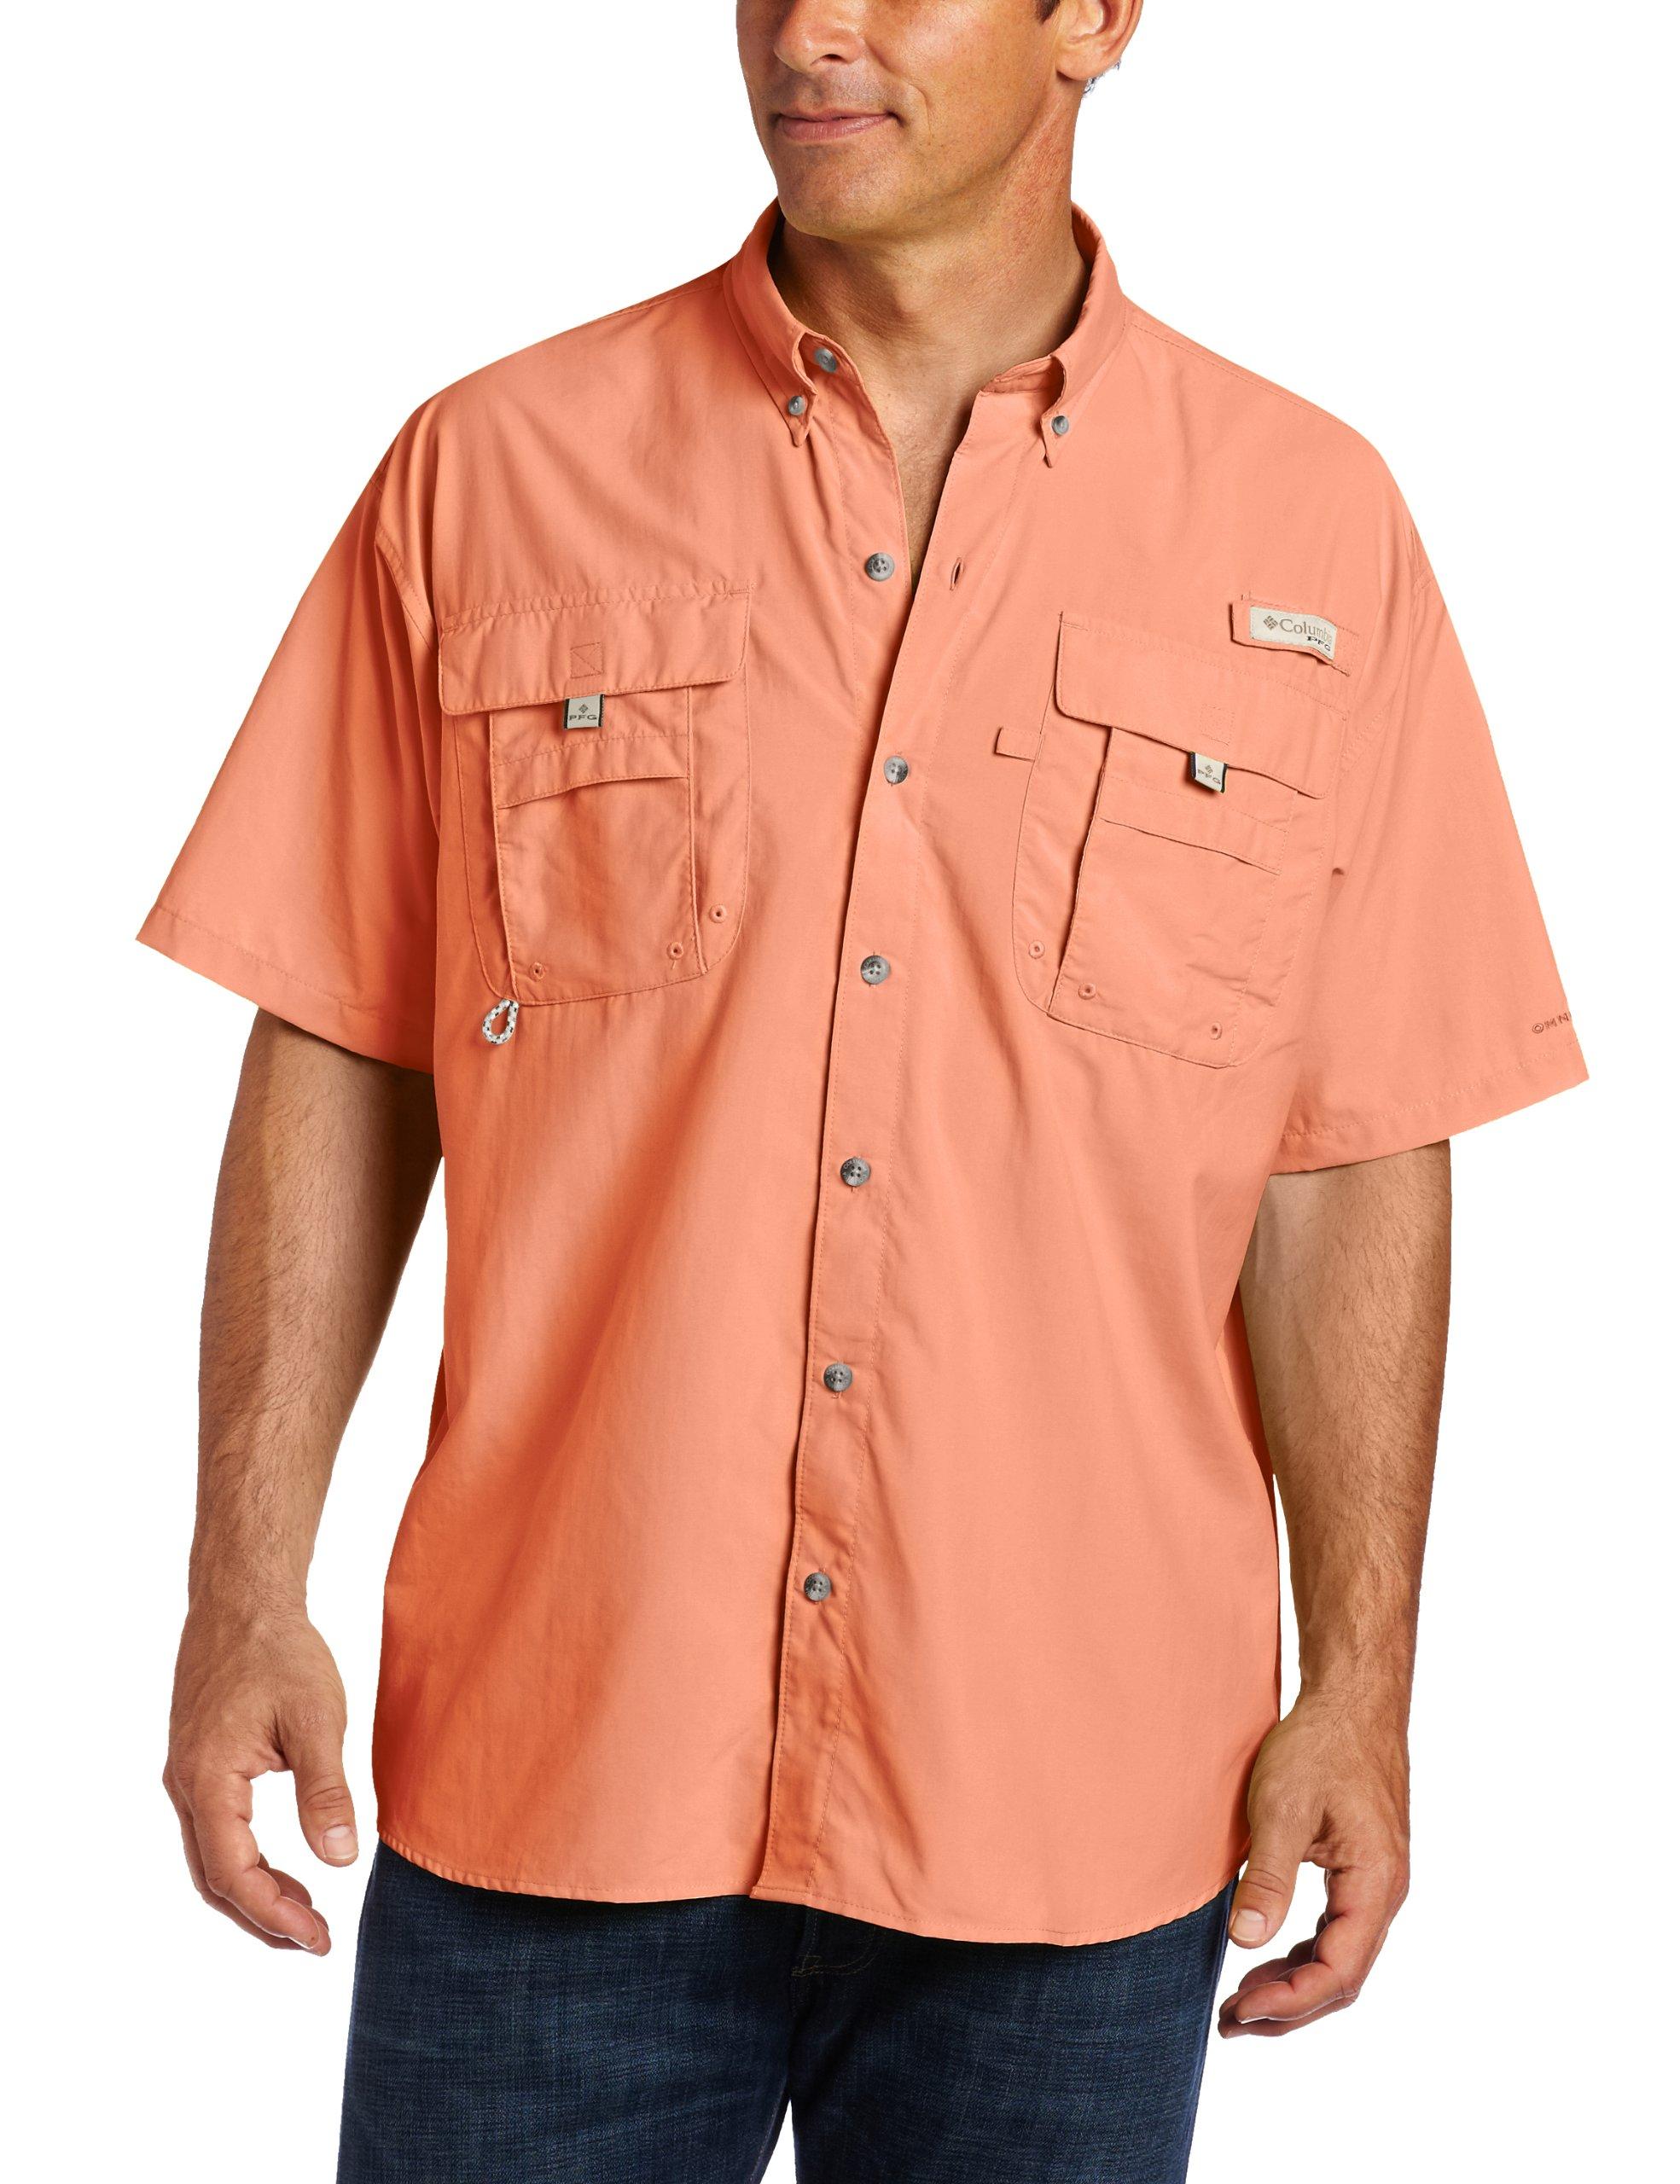 Columbia Men's PFG Bahama II Short Sleeve Shirt, Breathable with UV Protection